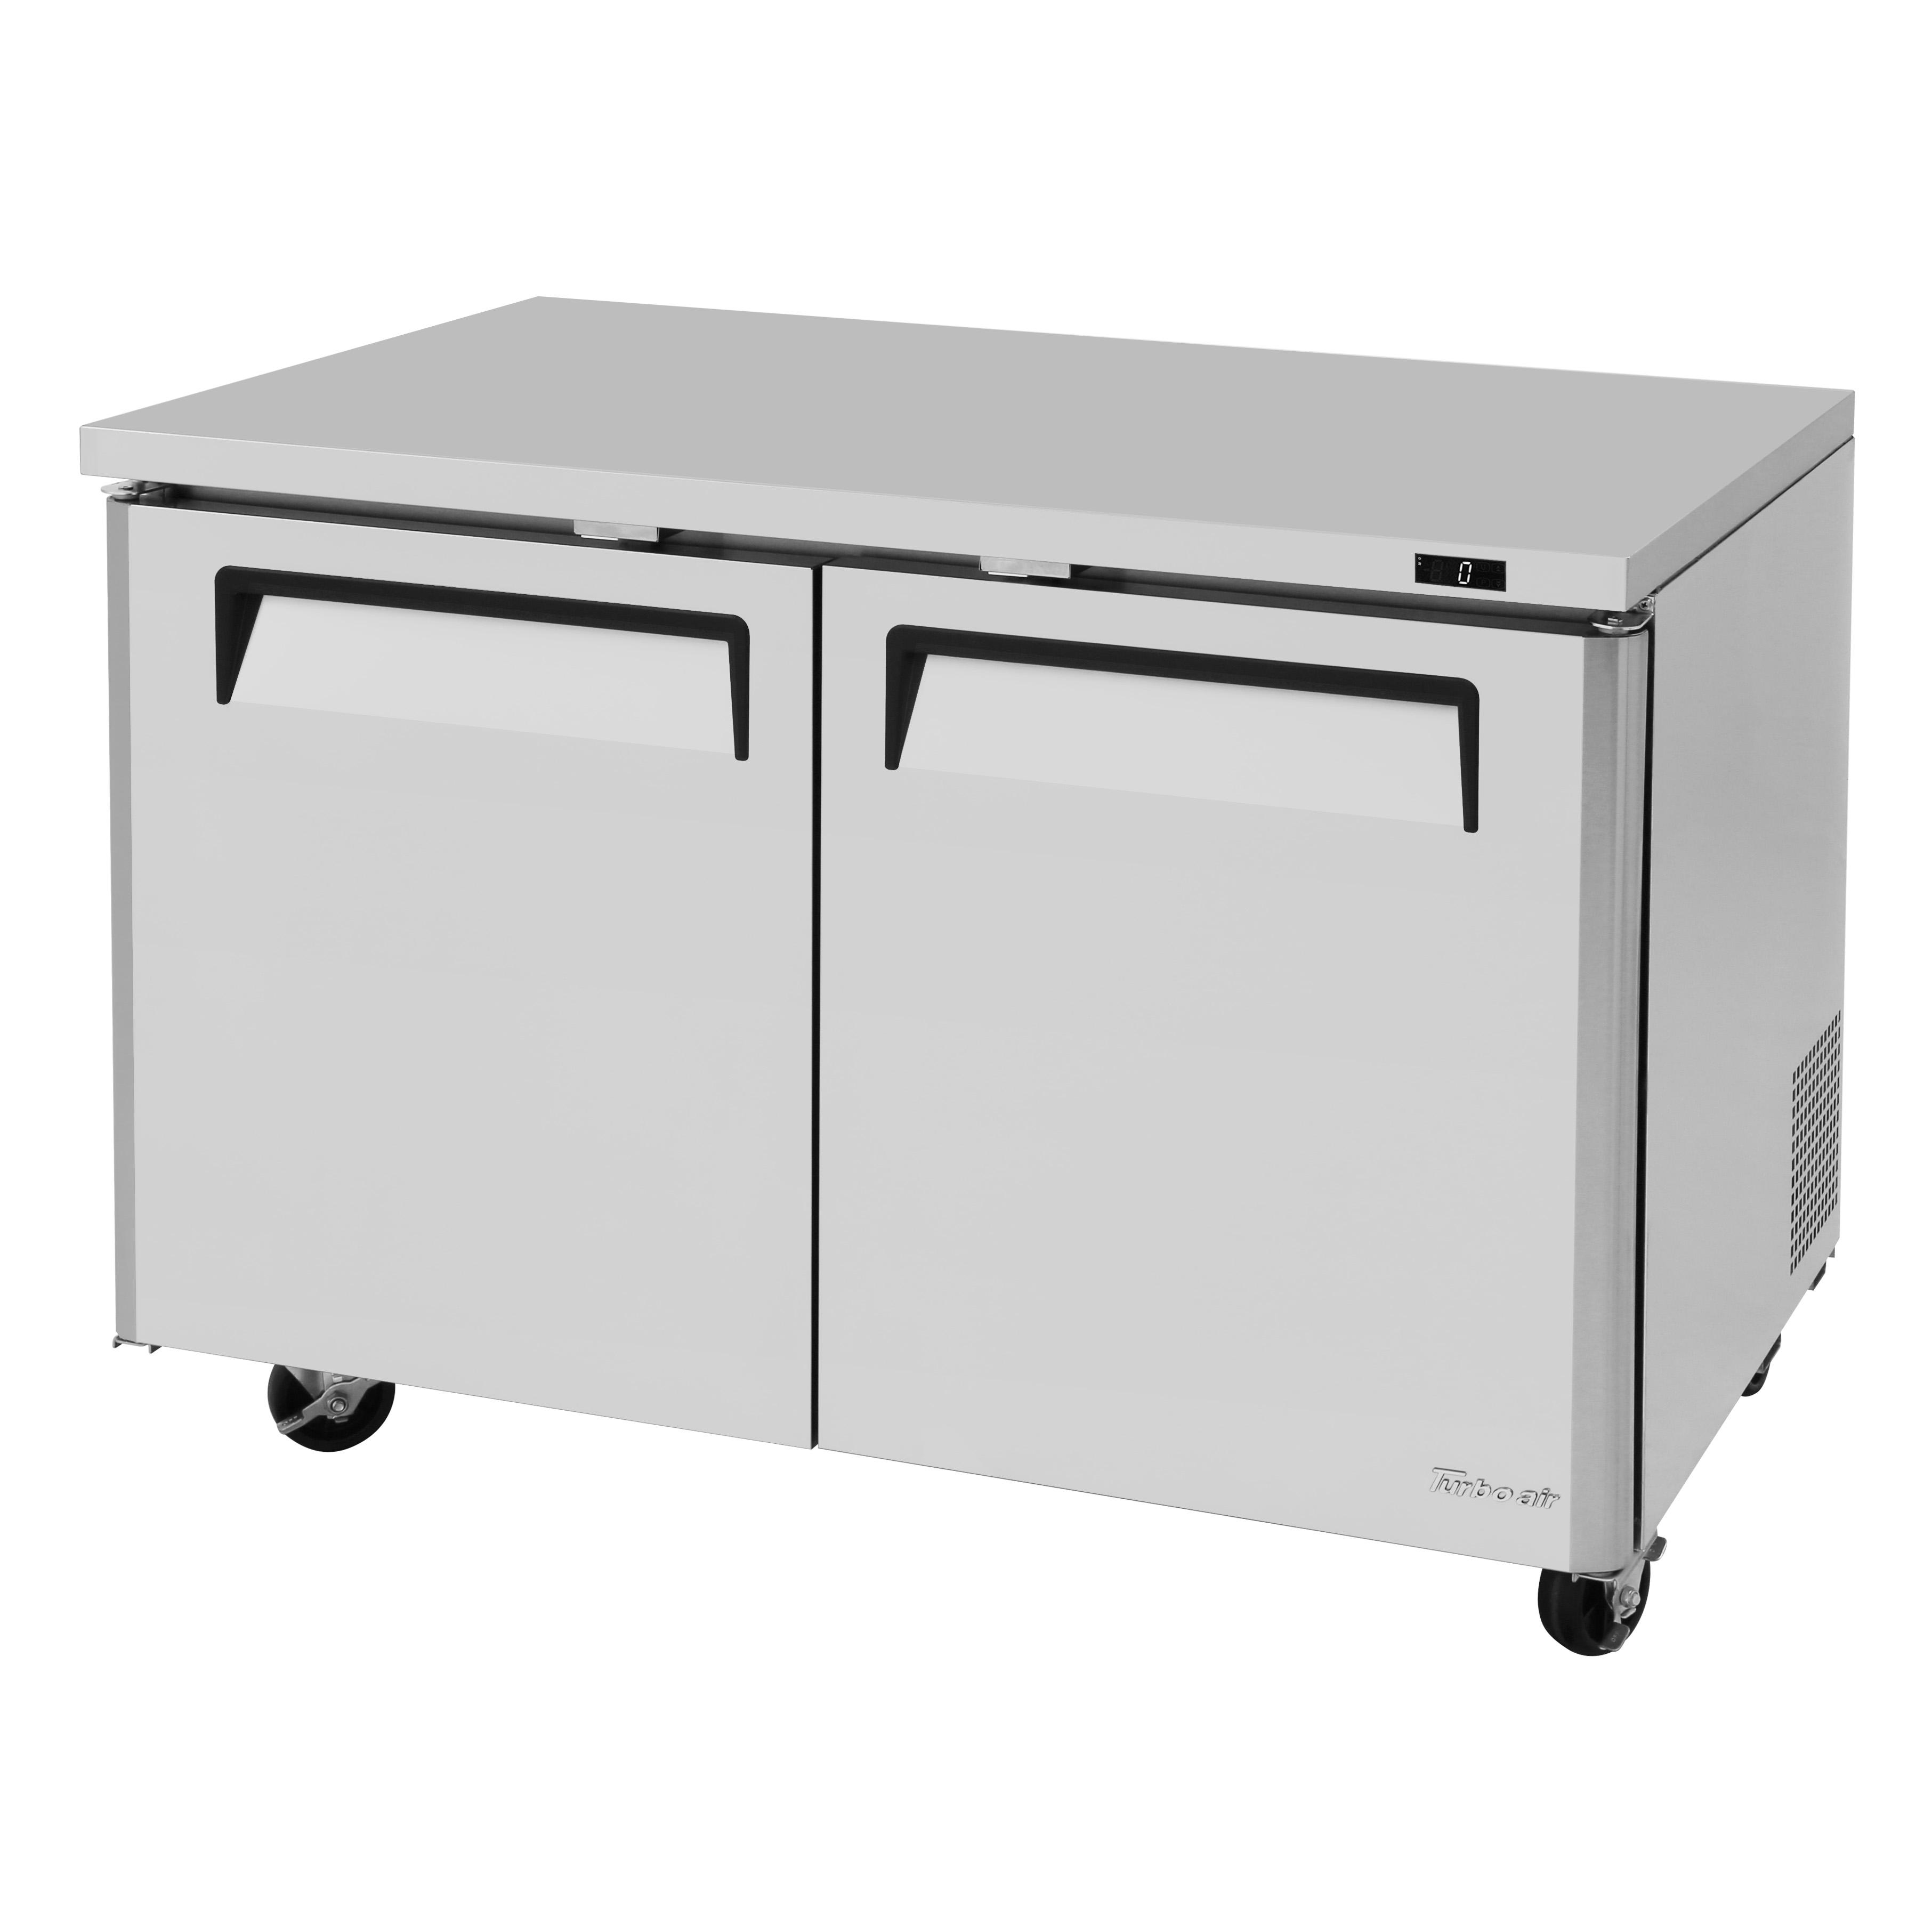 Turbo Air MUF-48-N freezer, undercounter, reach-in